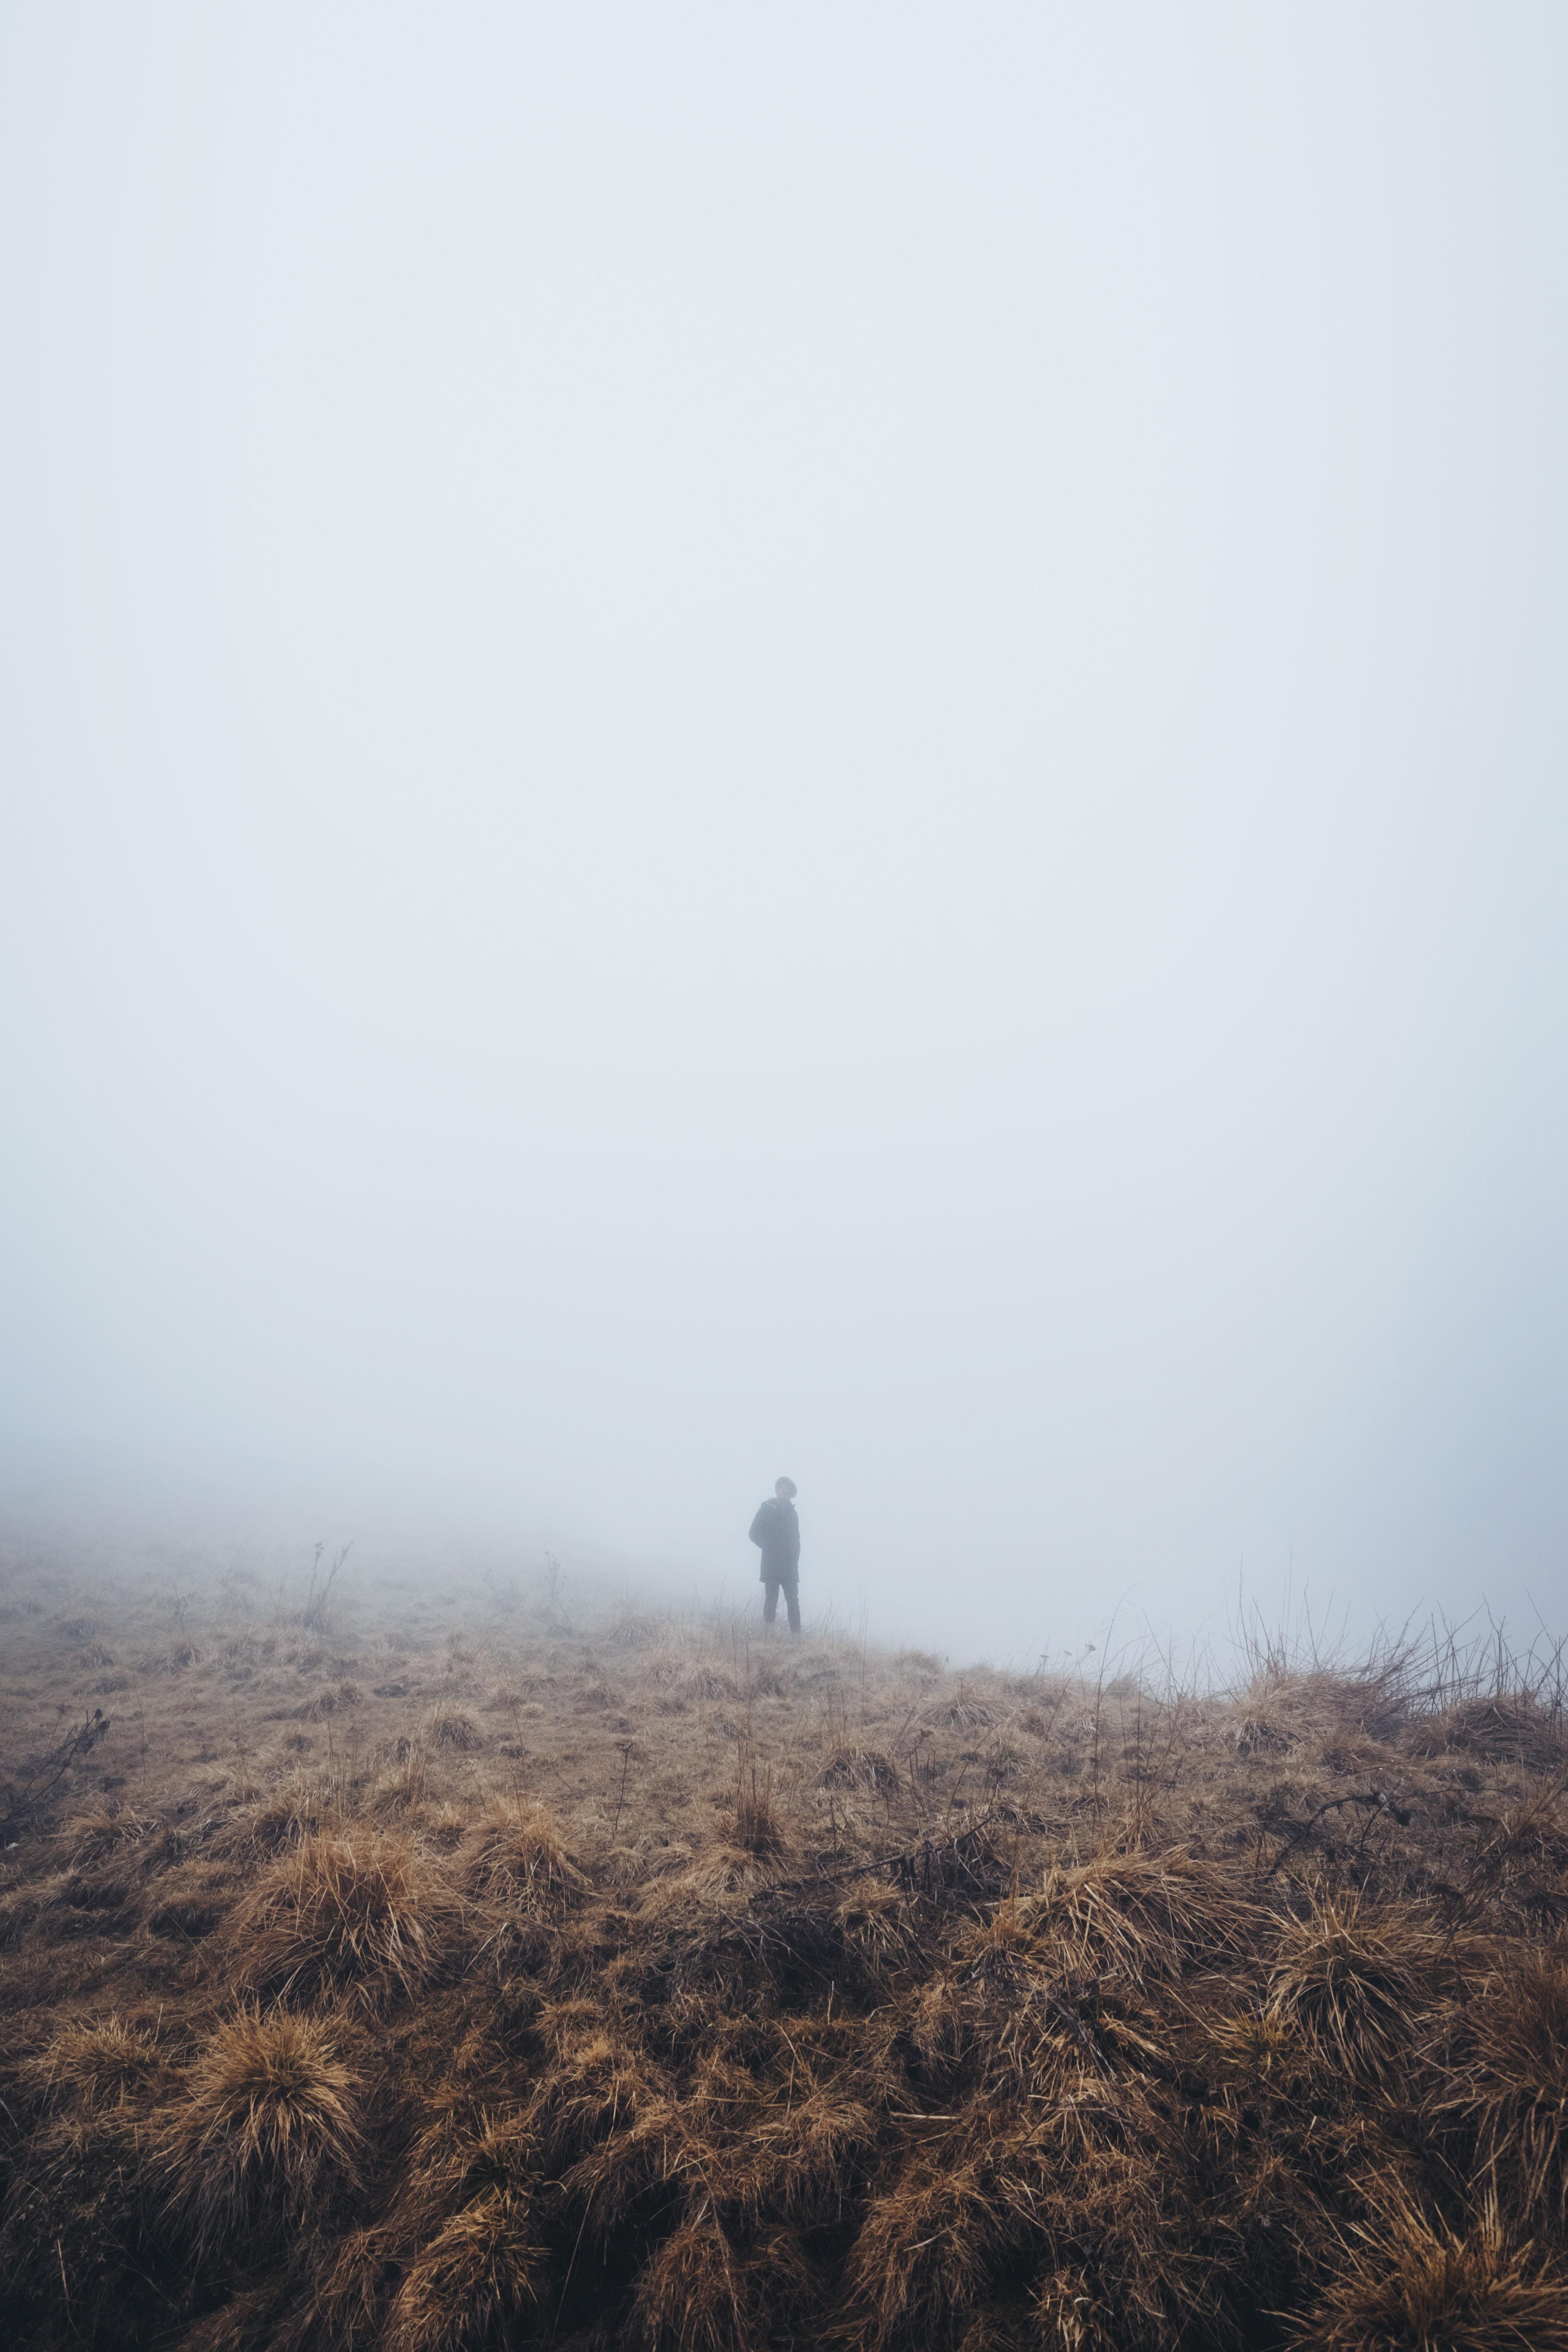 Silhouette of hiker walking through desolate prairies on a foggy day